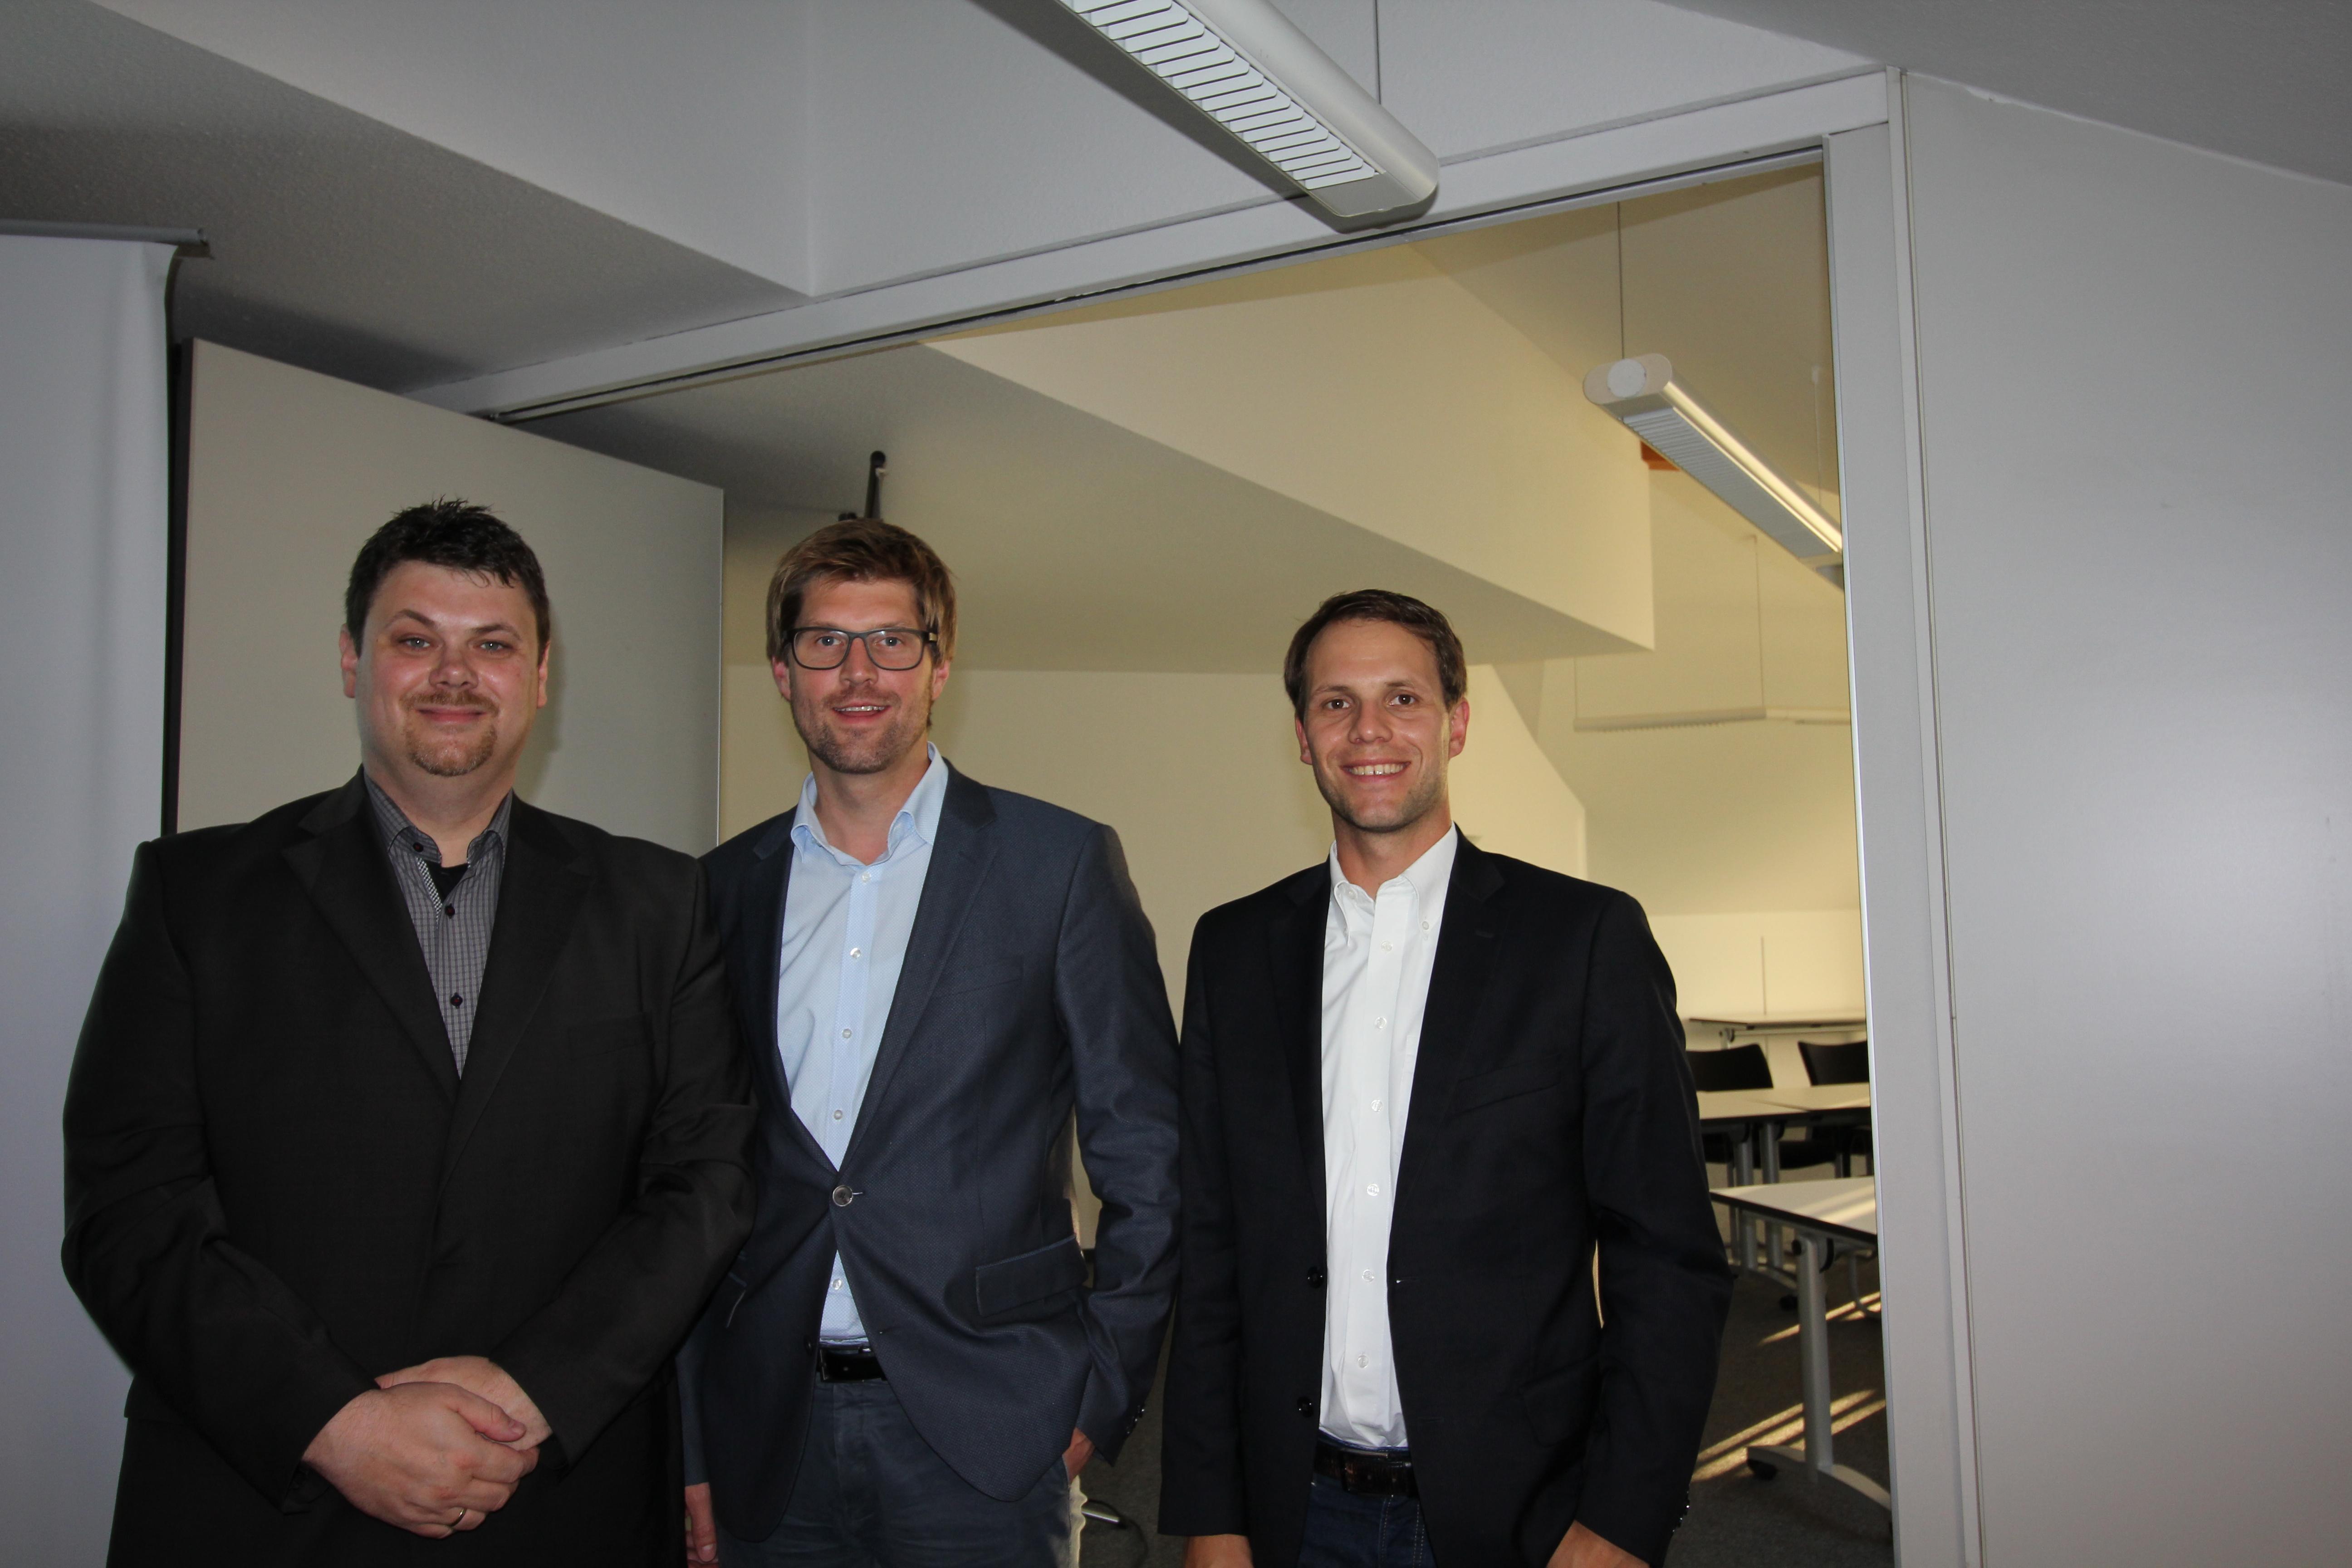 Referent und Gastgeber v.l.: Nikolaus Stapels (VdS Berater), Timm Stolley (Provinzial), Knut Voigt (WFA)